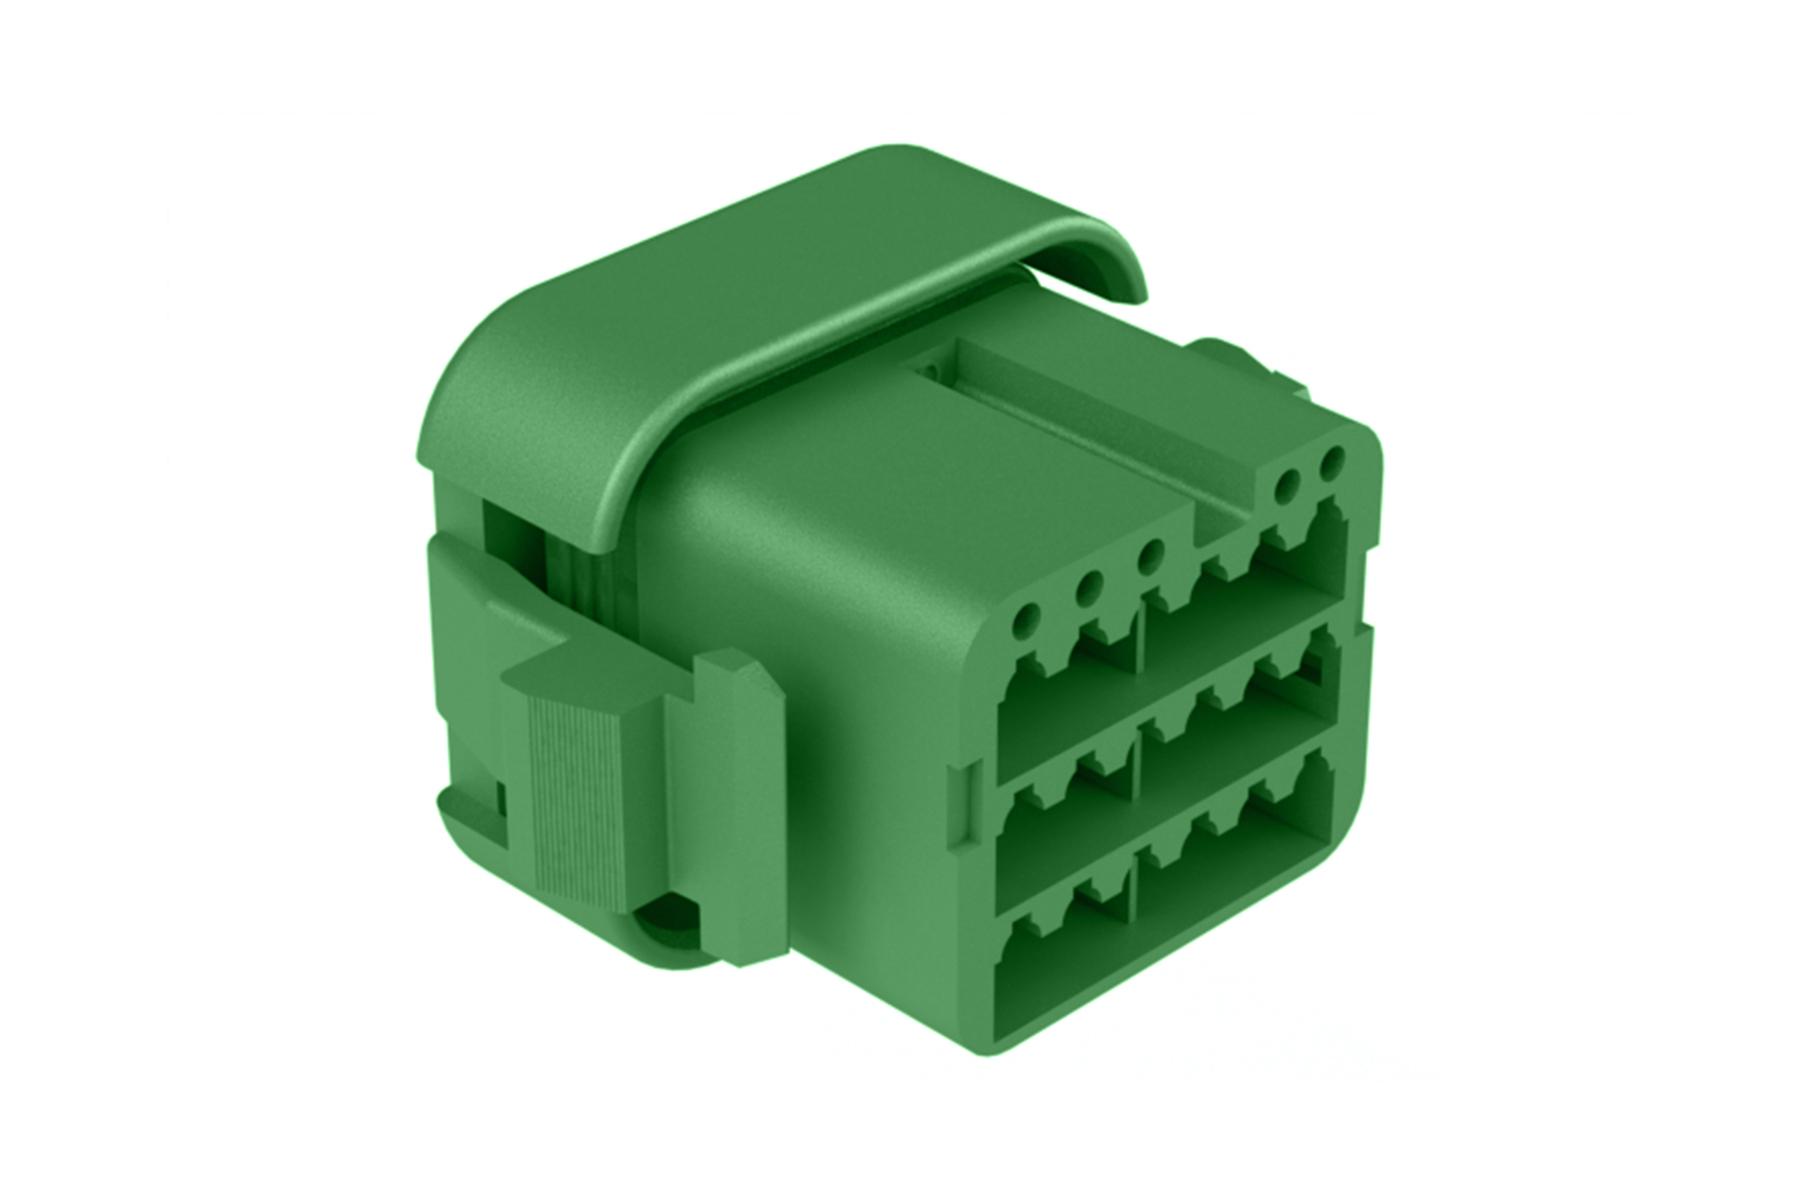 ATV06-18SC 18 position plug, Size 16 contact, key C, standard seal